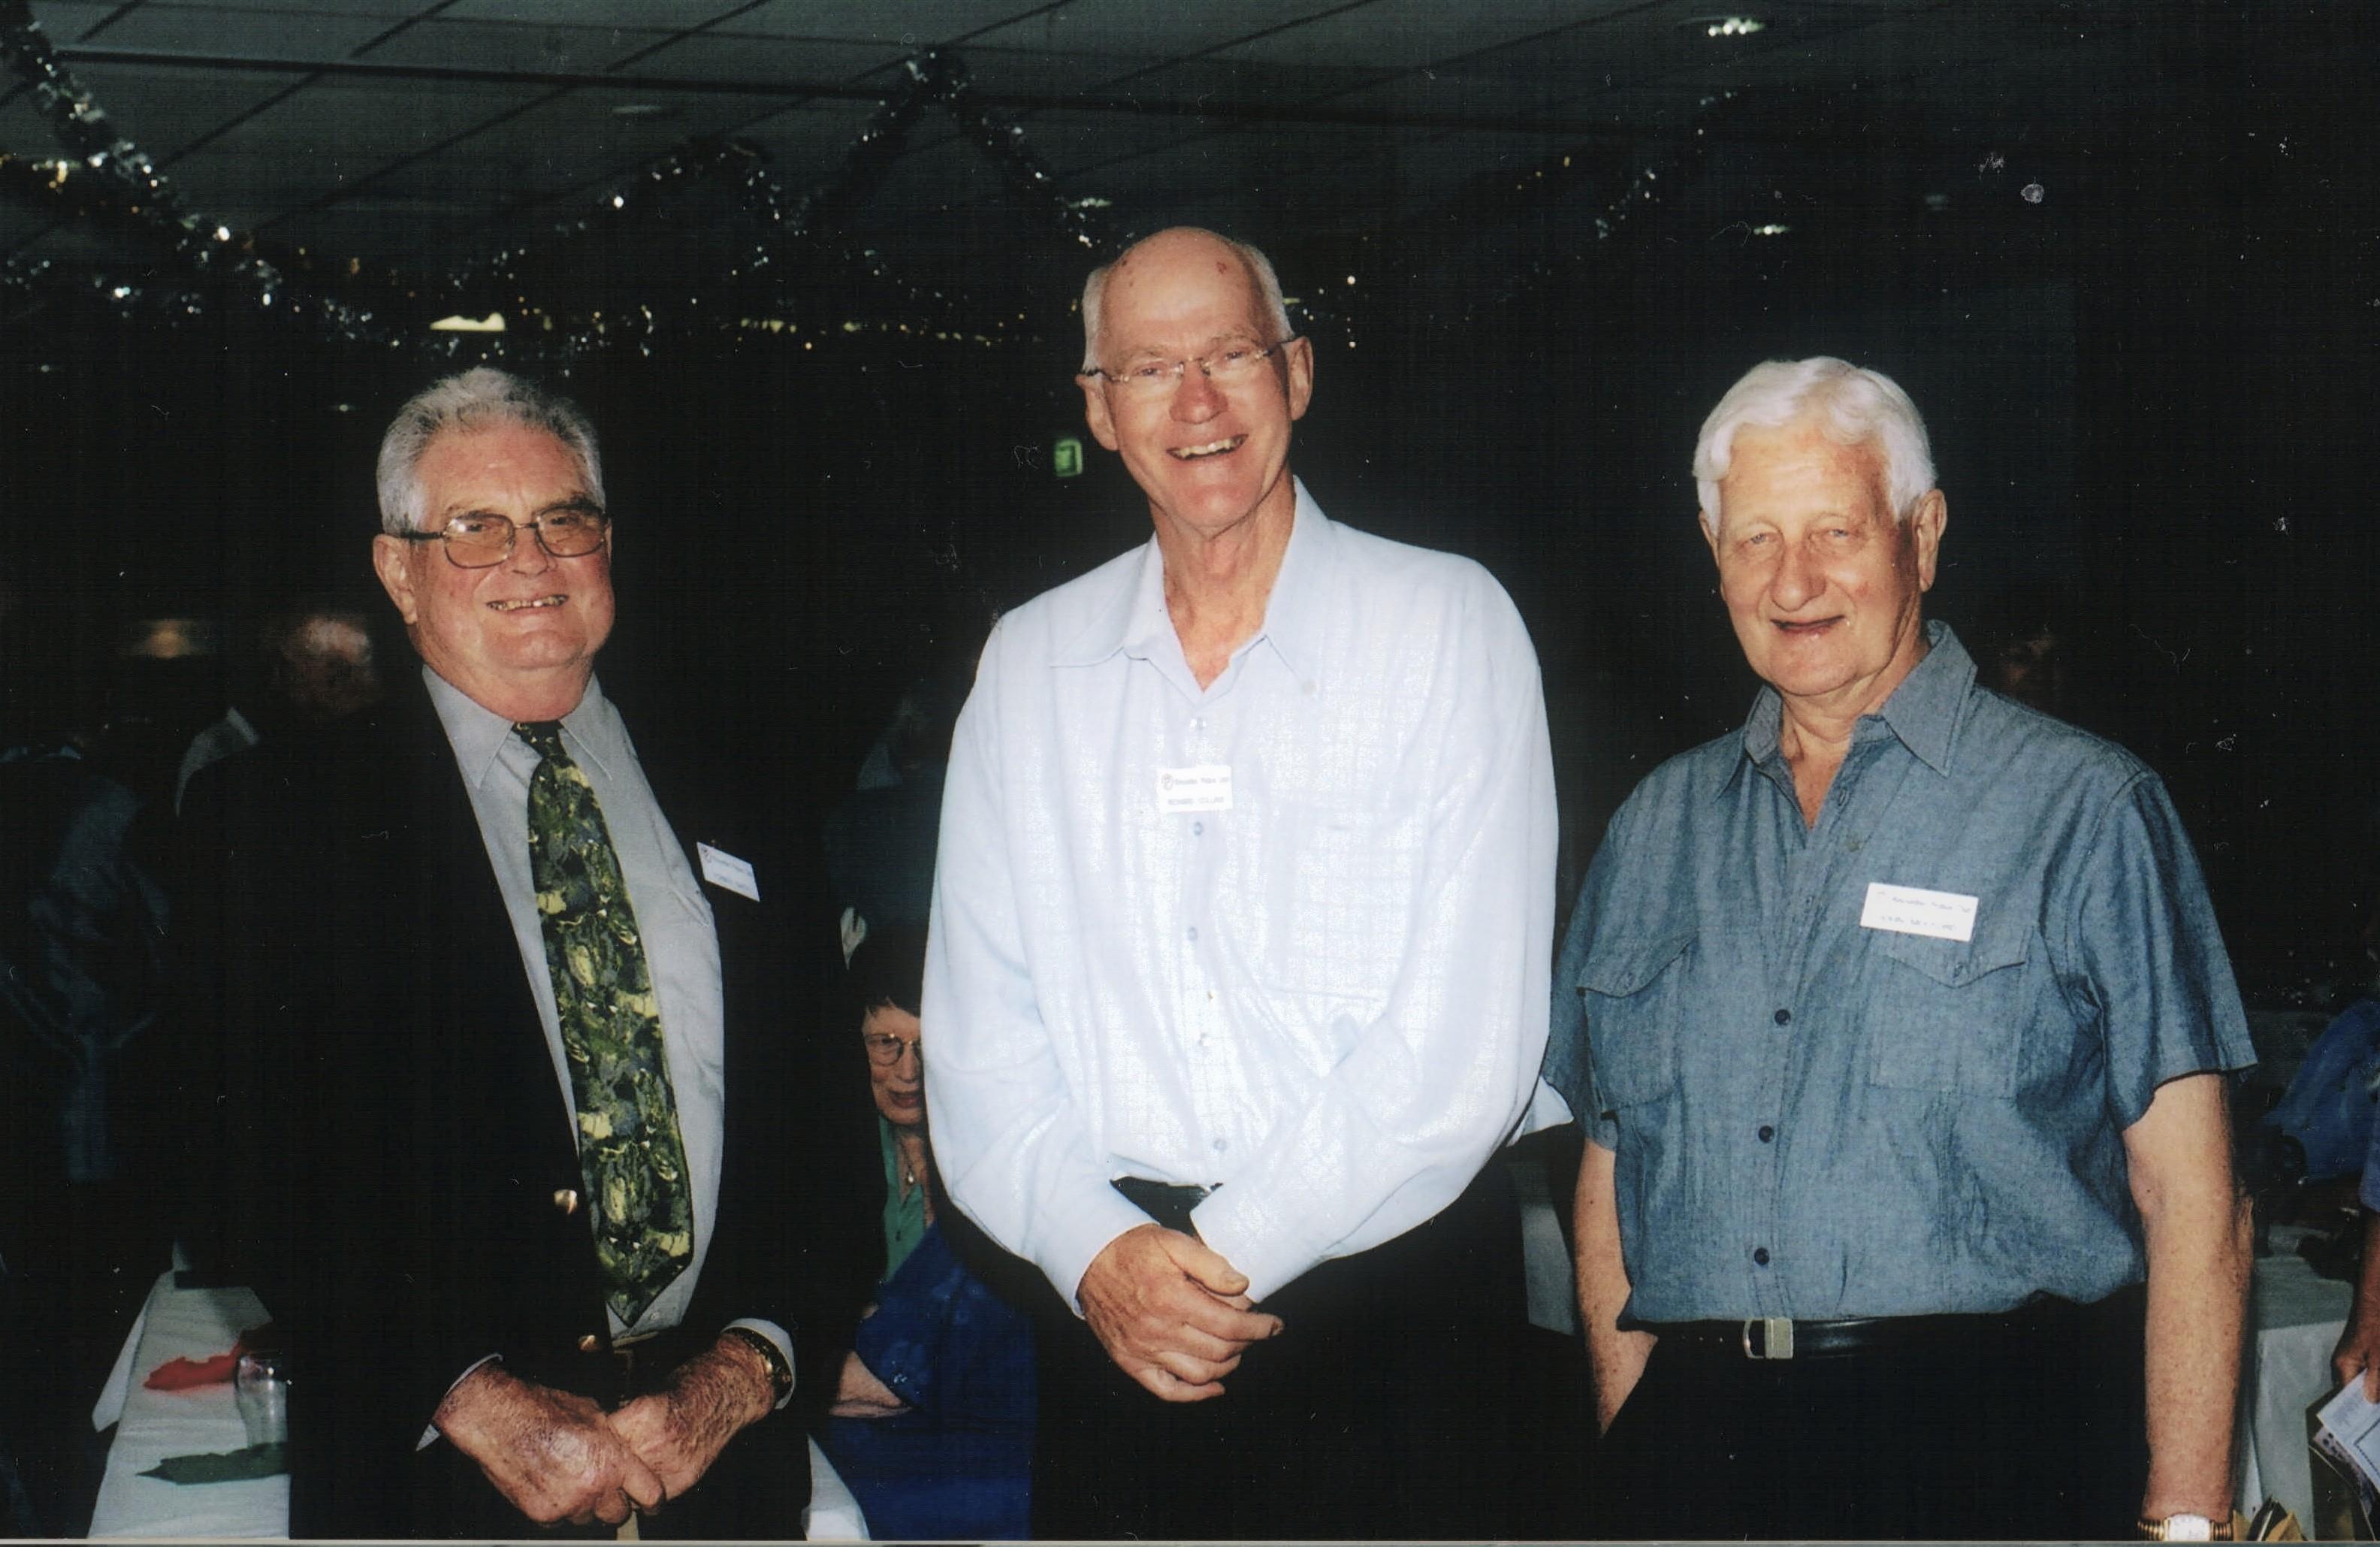 2003 Activities Christmas Luncheon at Av